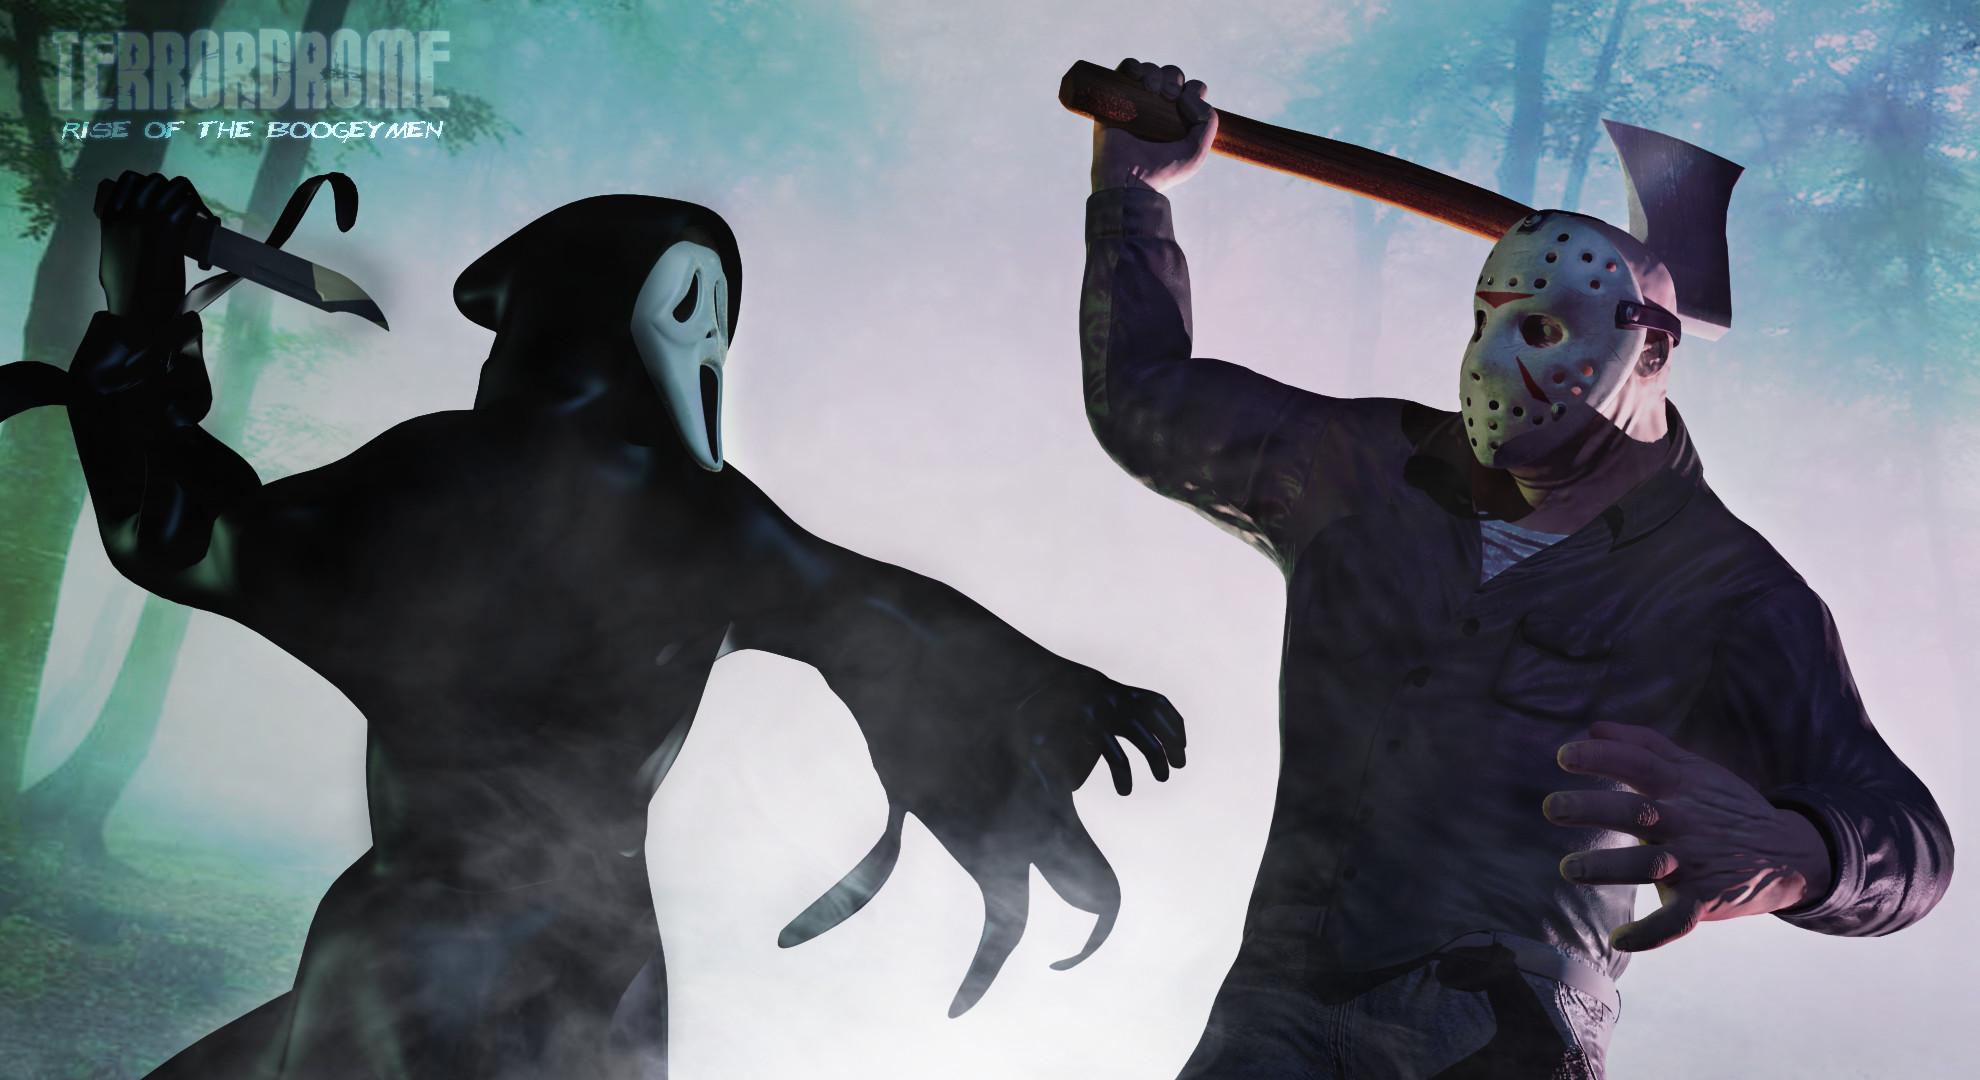 Ghostface vs Classic Jason Voorhees